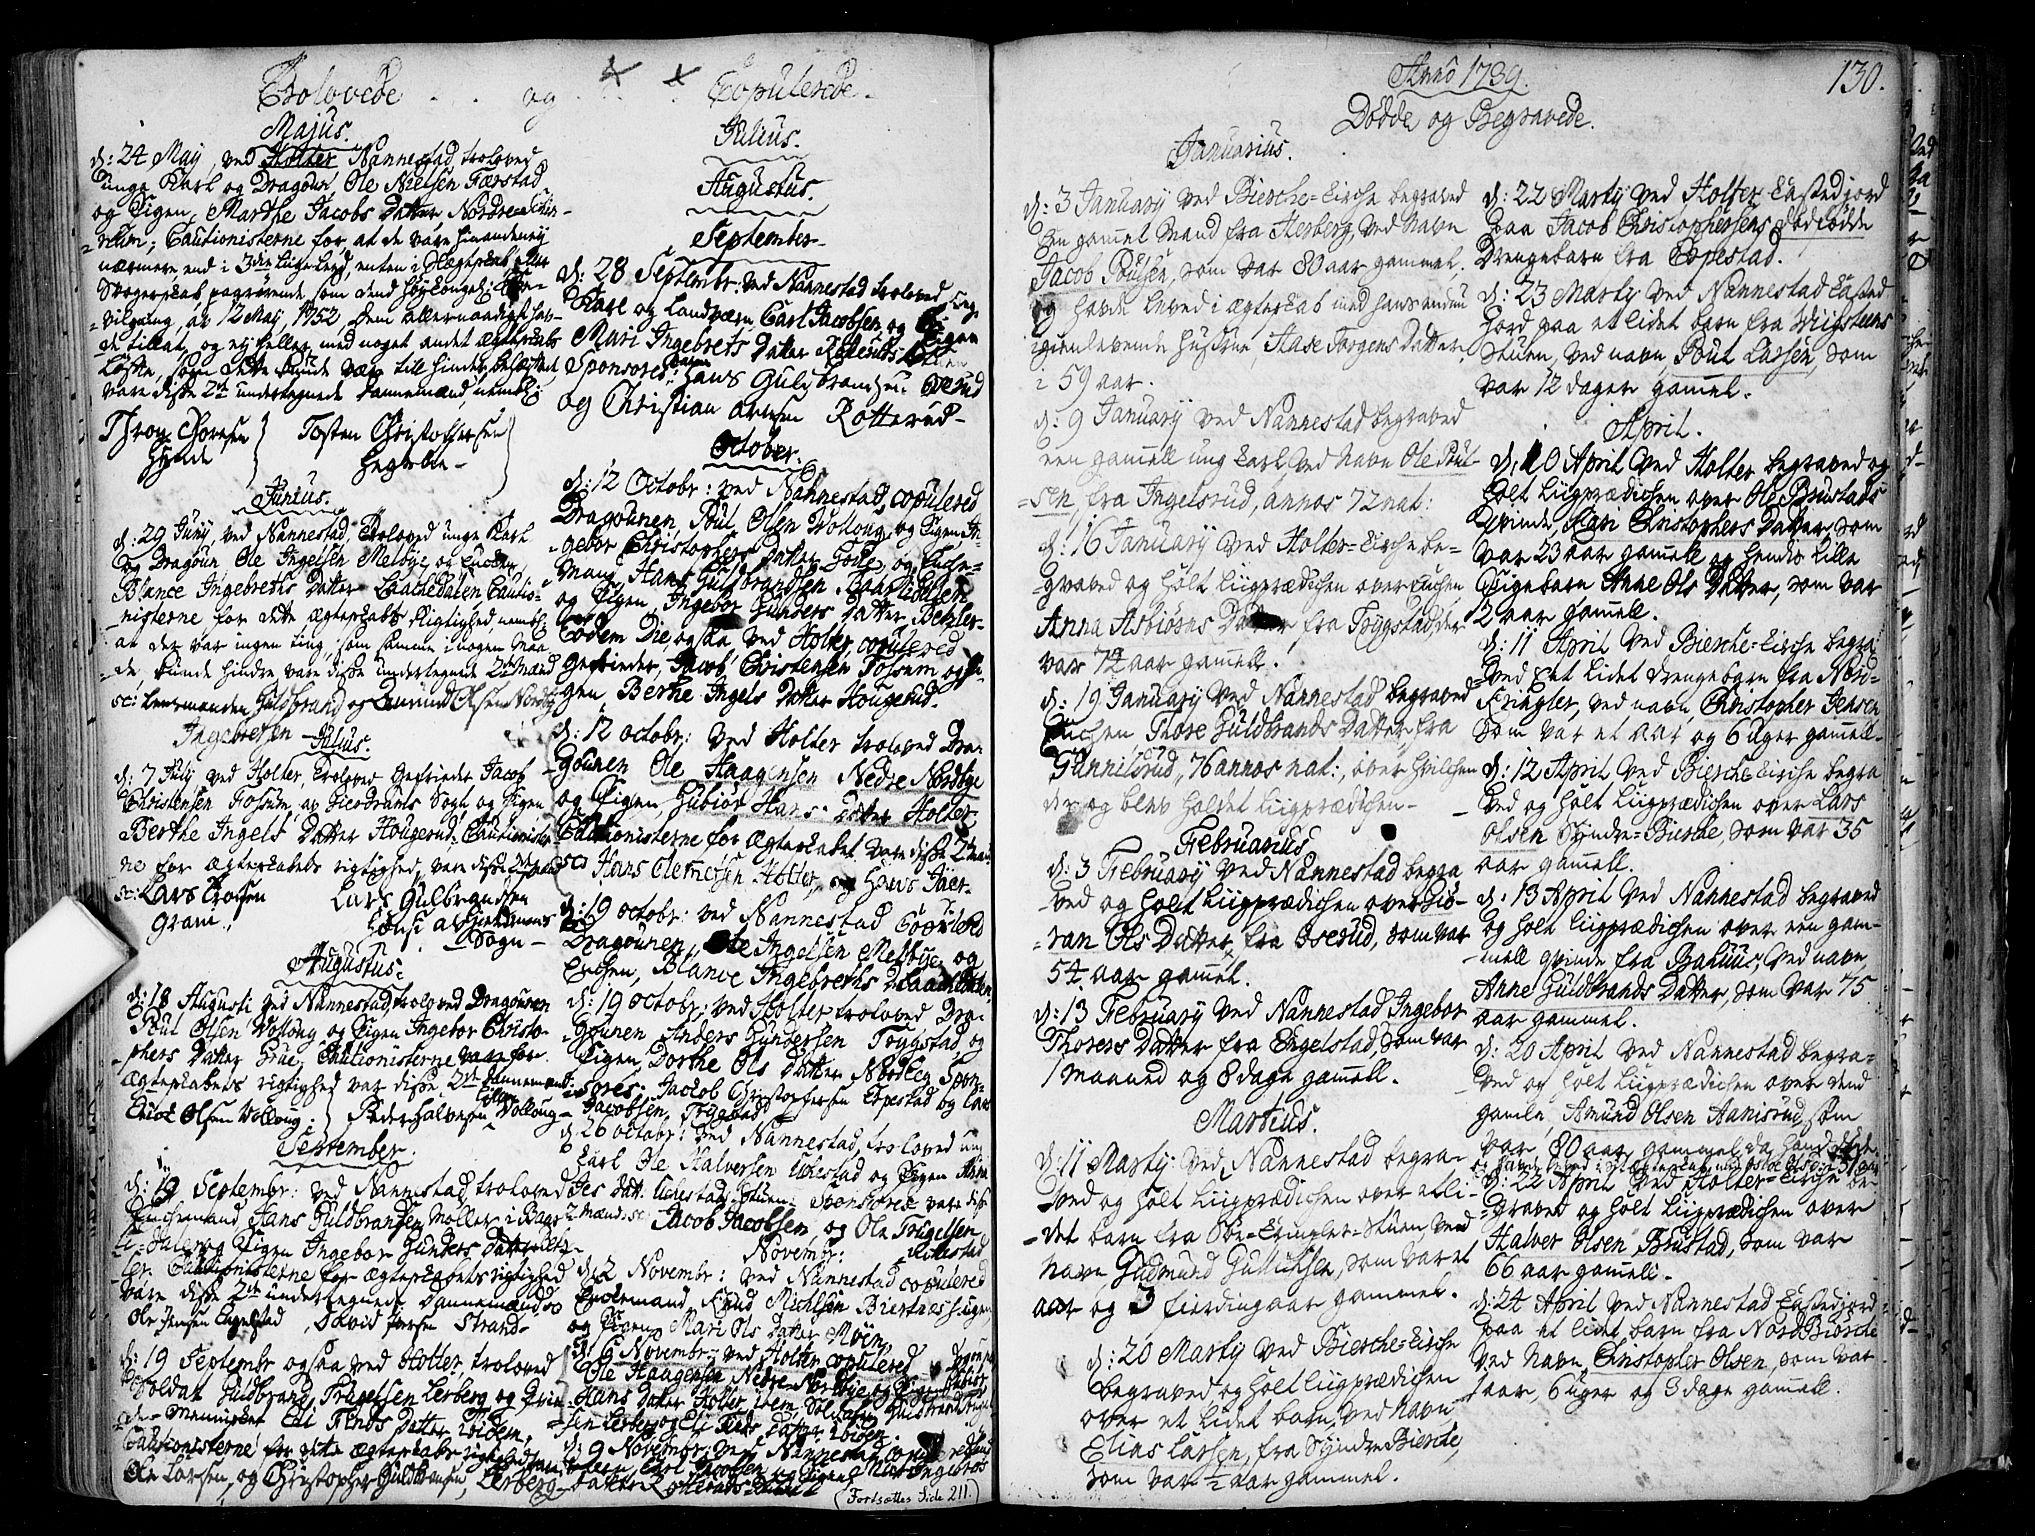 SAO, Nannestad prestekontor Kirkebøker, F/Fa/L0006: Ministerialbok nr. I 6, 1739-1754, s. 130